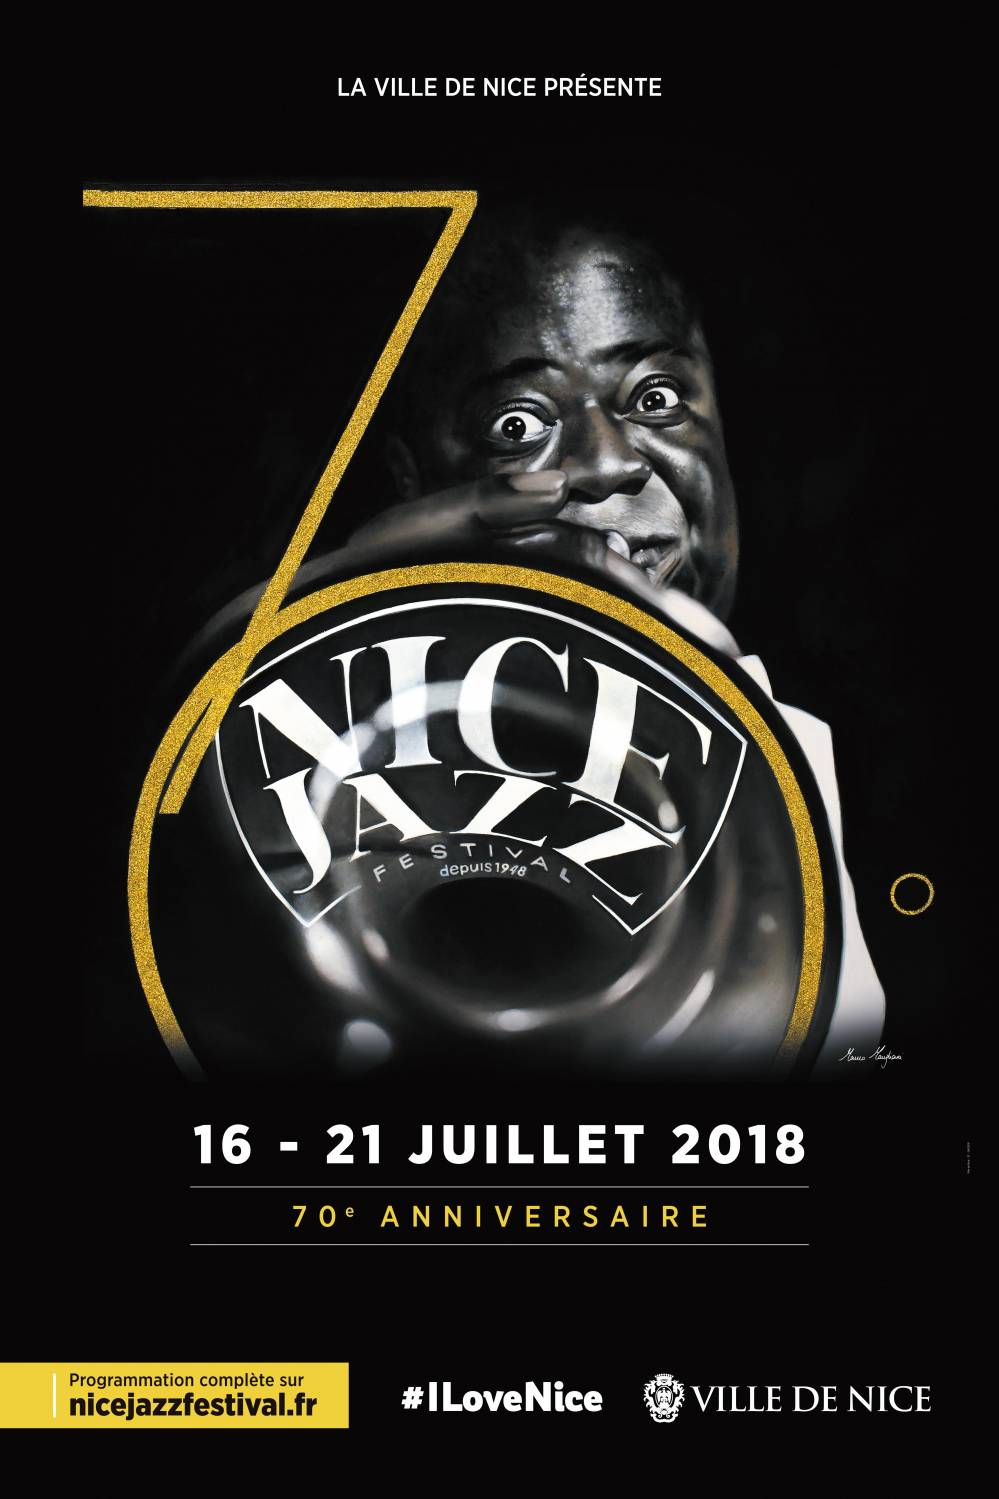 festival 21 juillet 2018